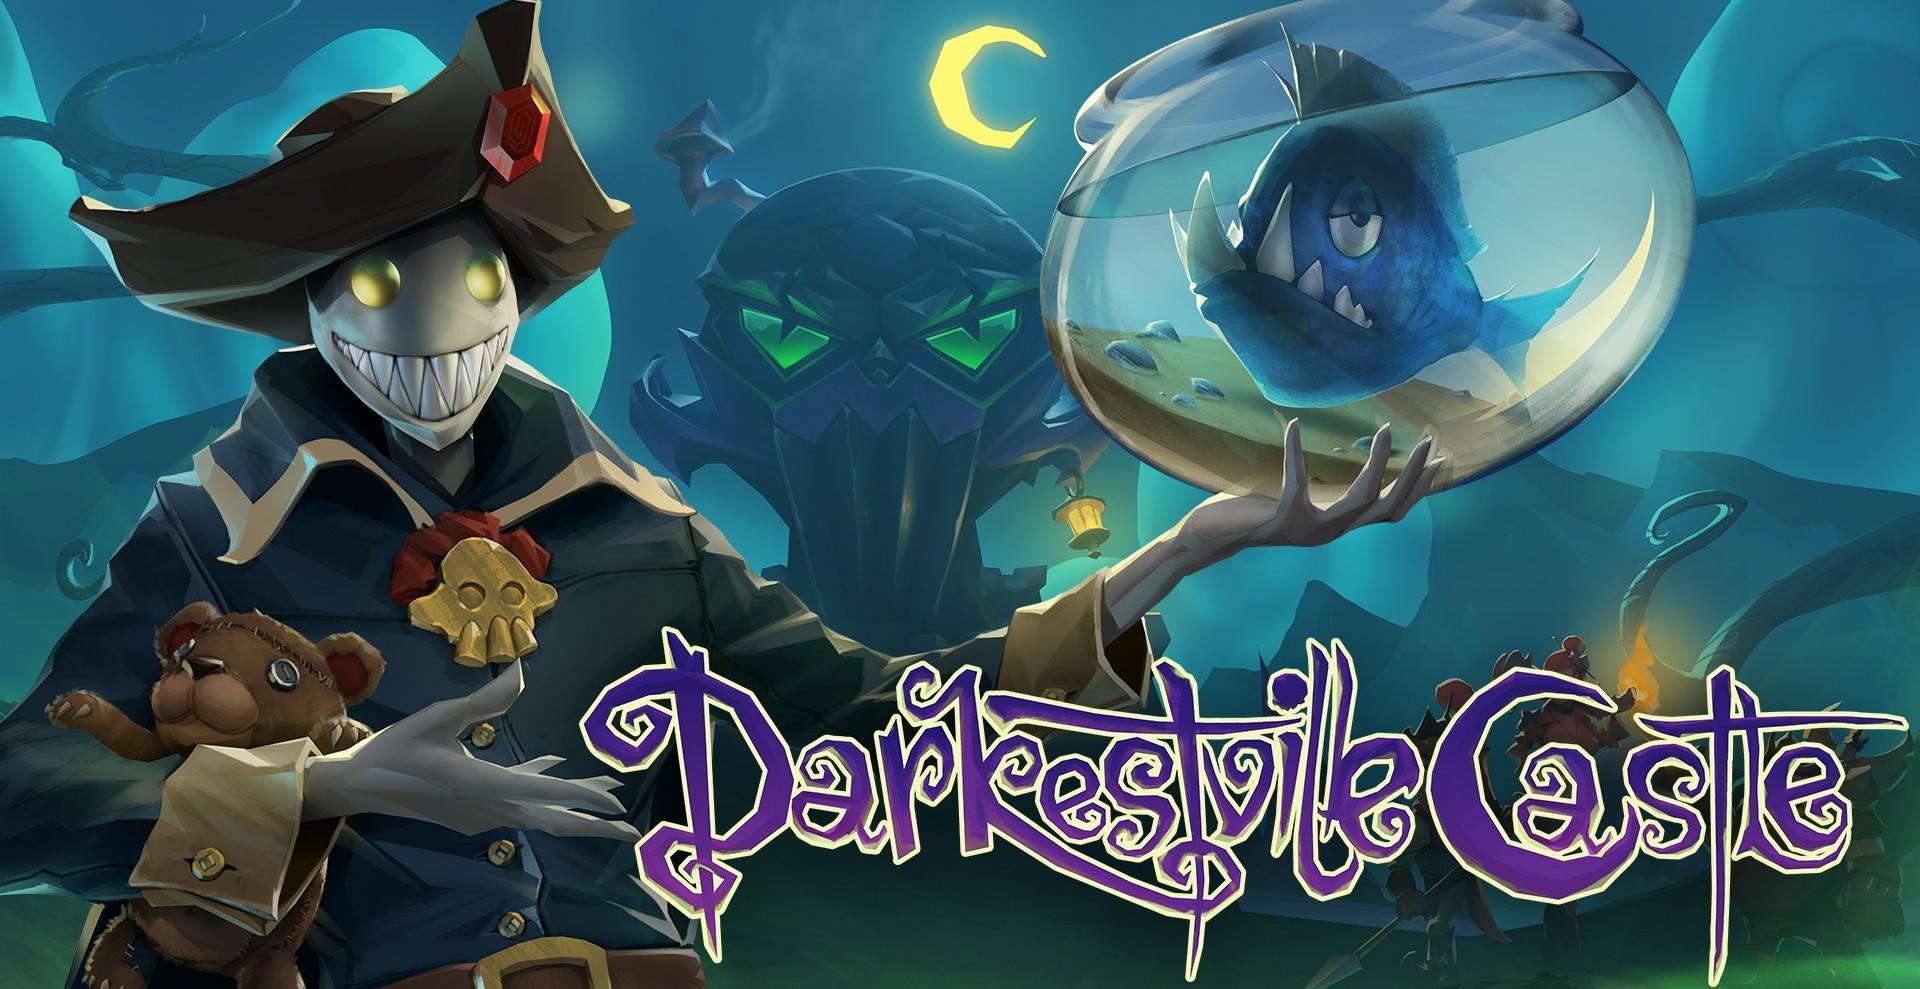 Darkestville Castle 10